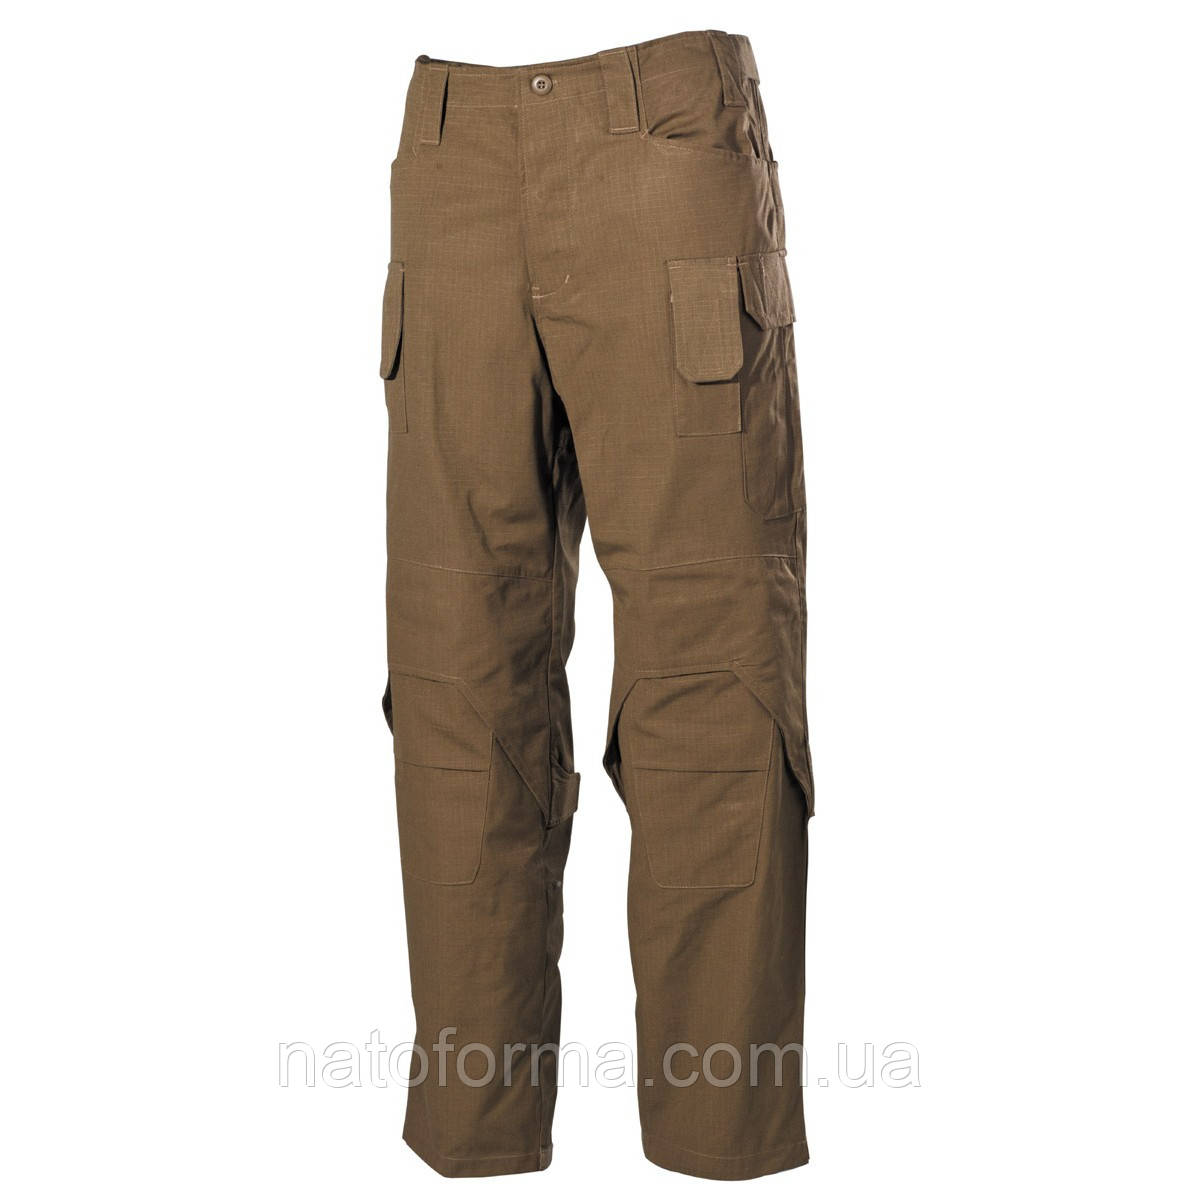 Штаны, брюки тактические Mission, Ny/Co, MFH, койот